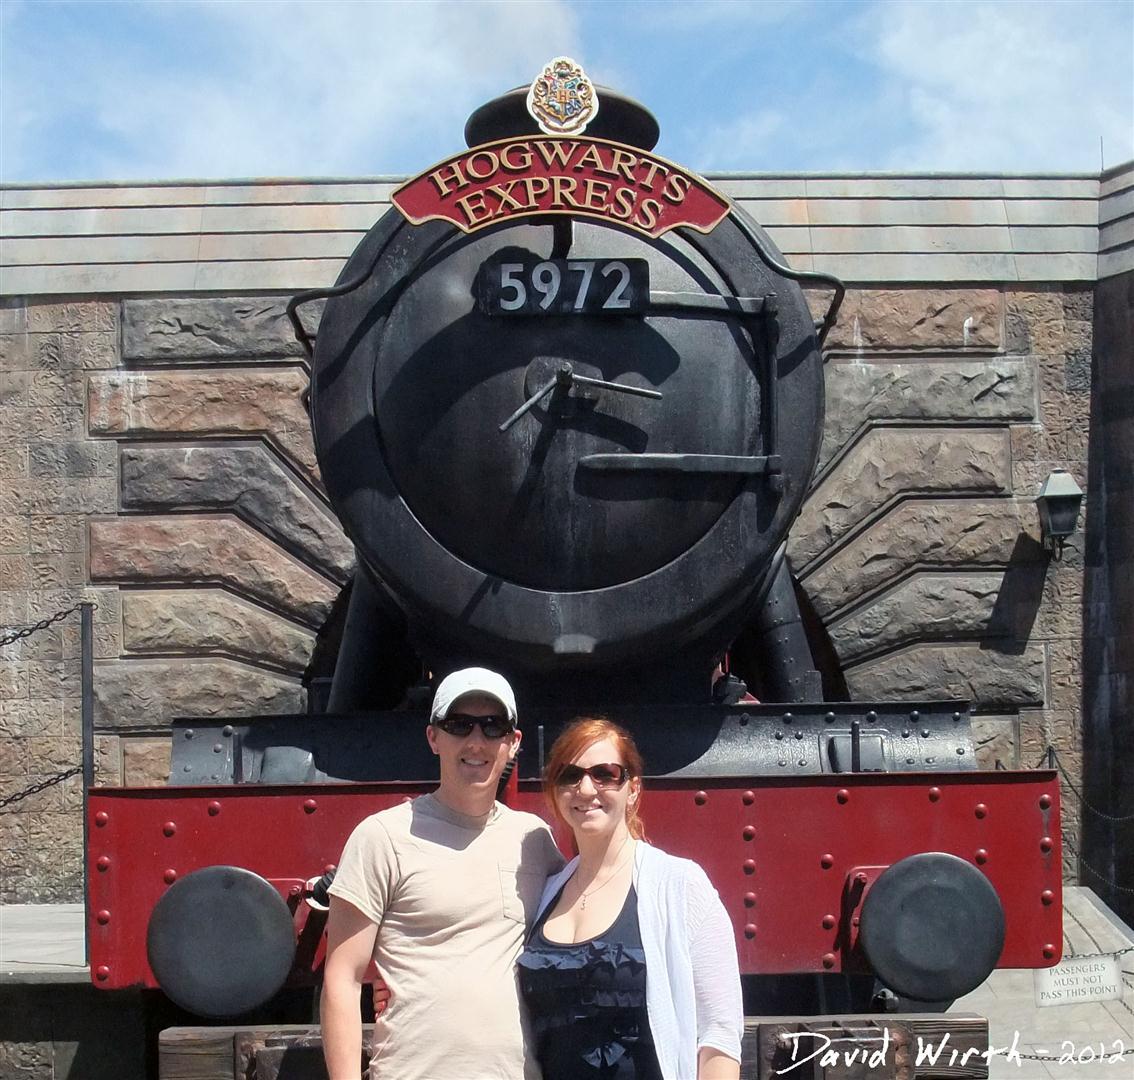 Hogwarts express front